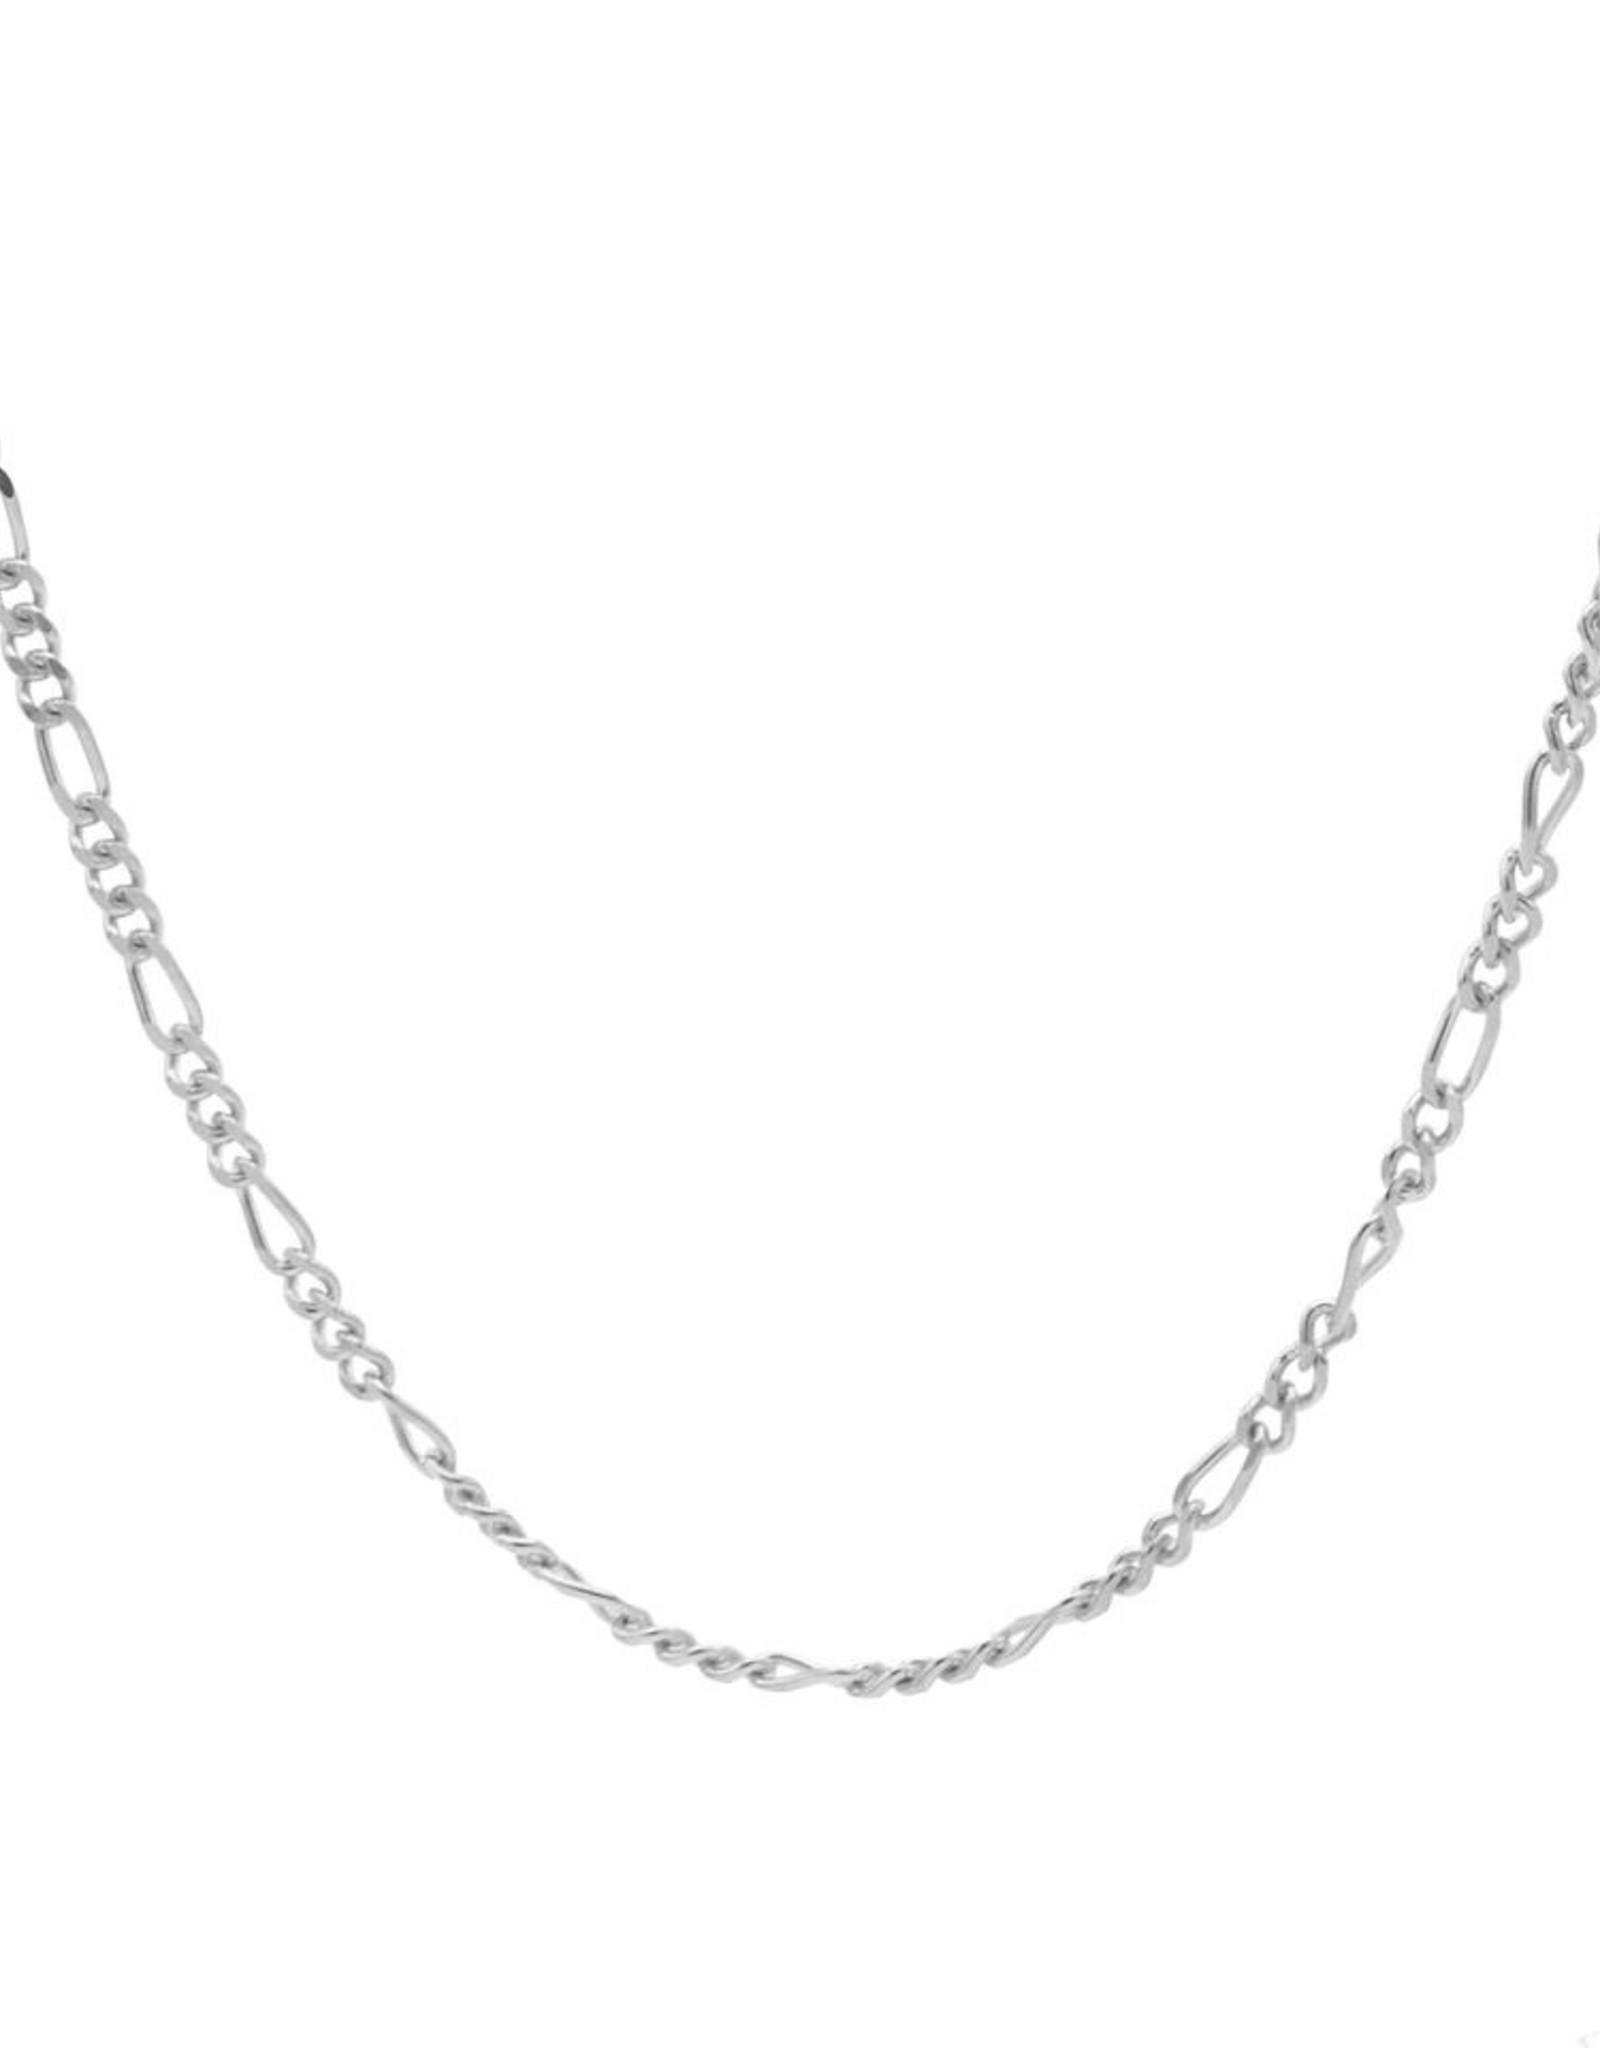 Karma Necklace Figaro Silver 50-57CM